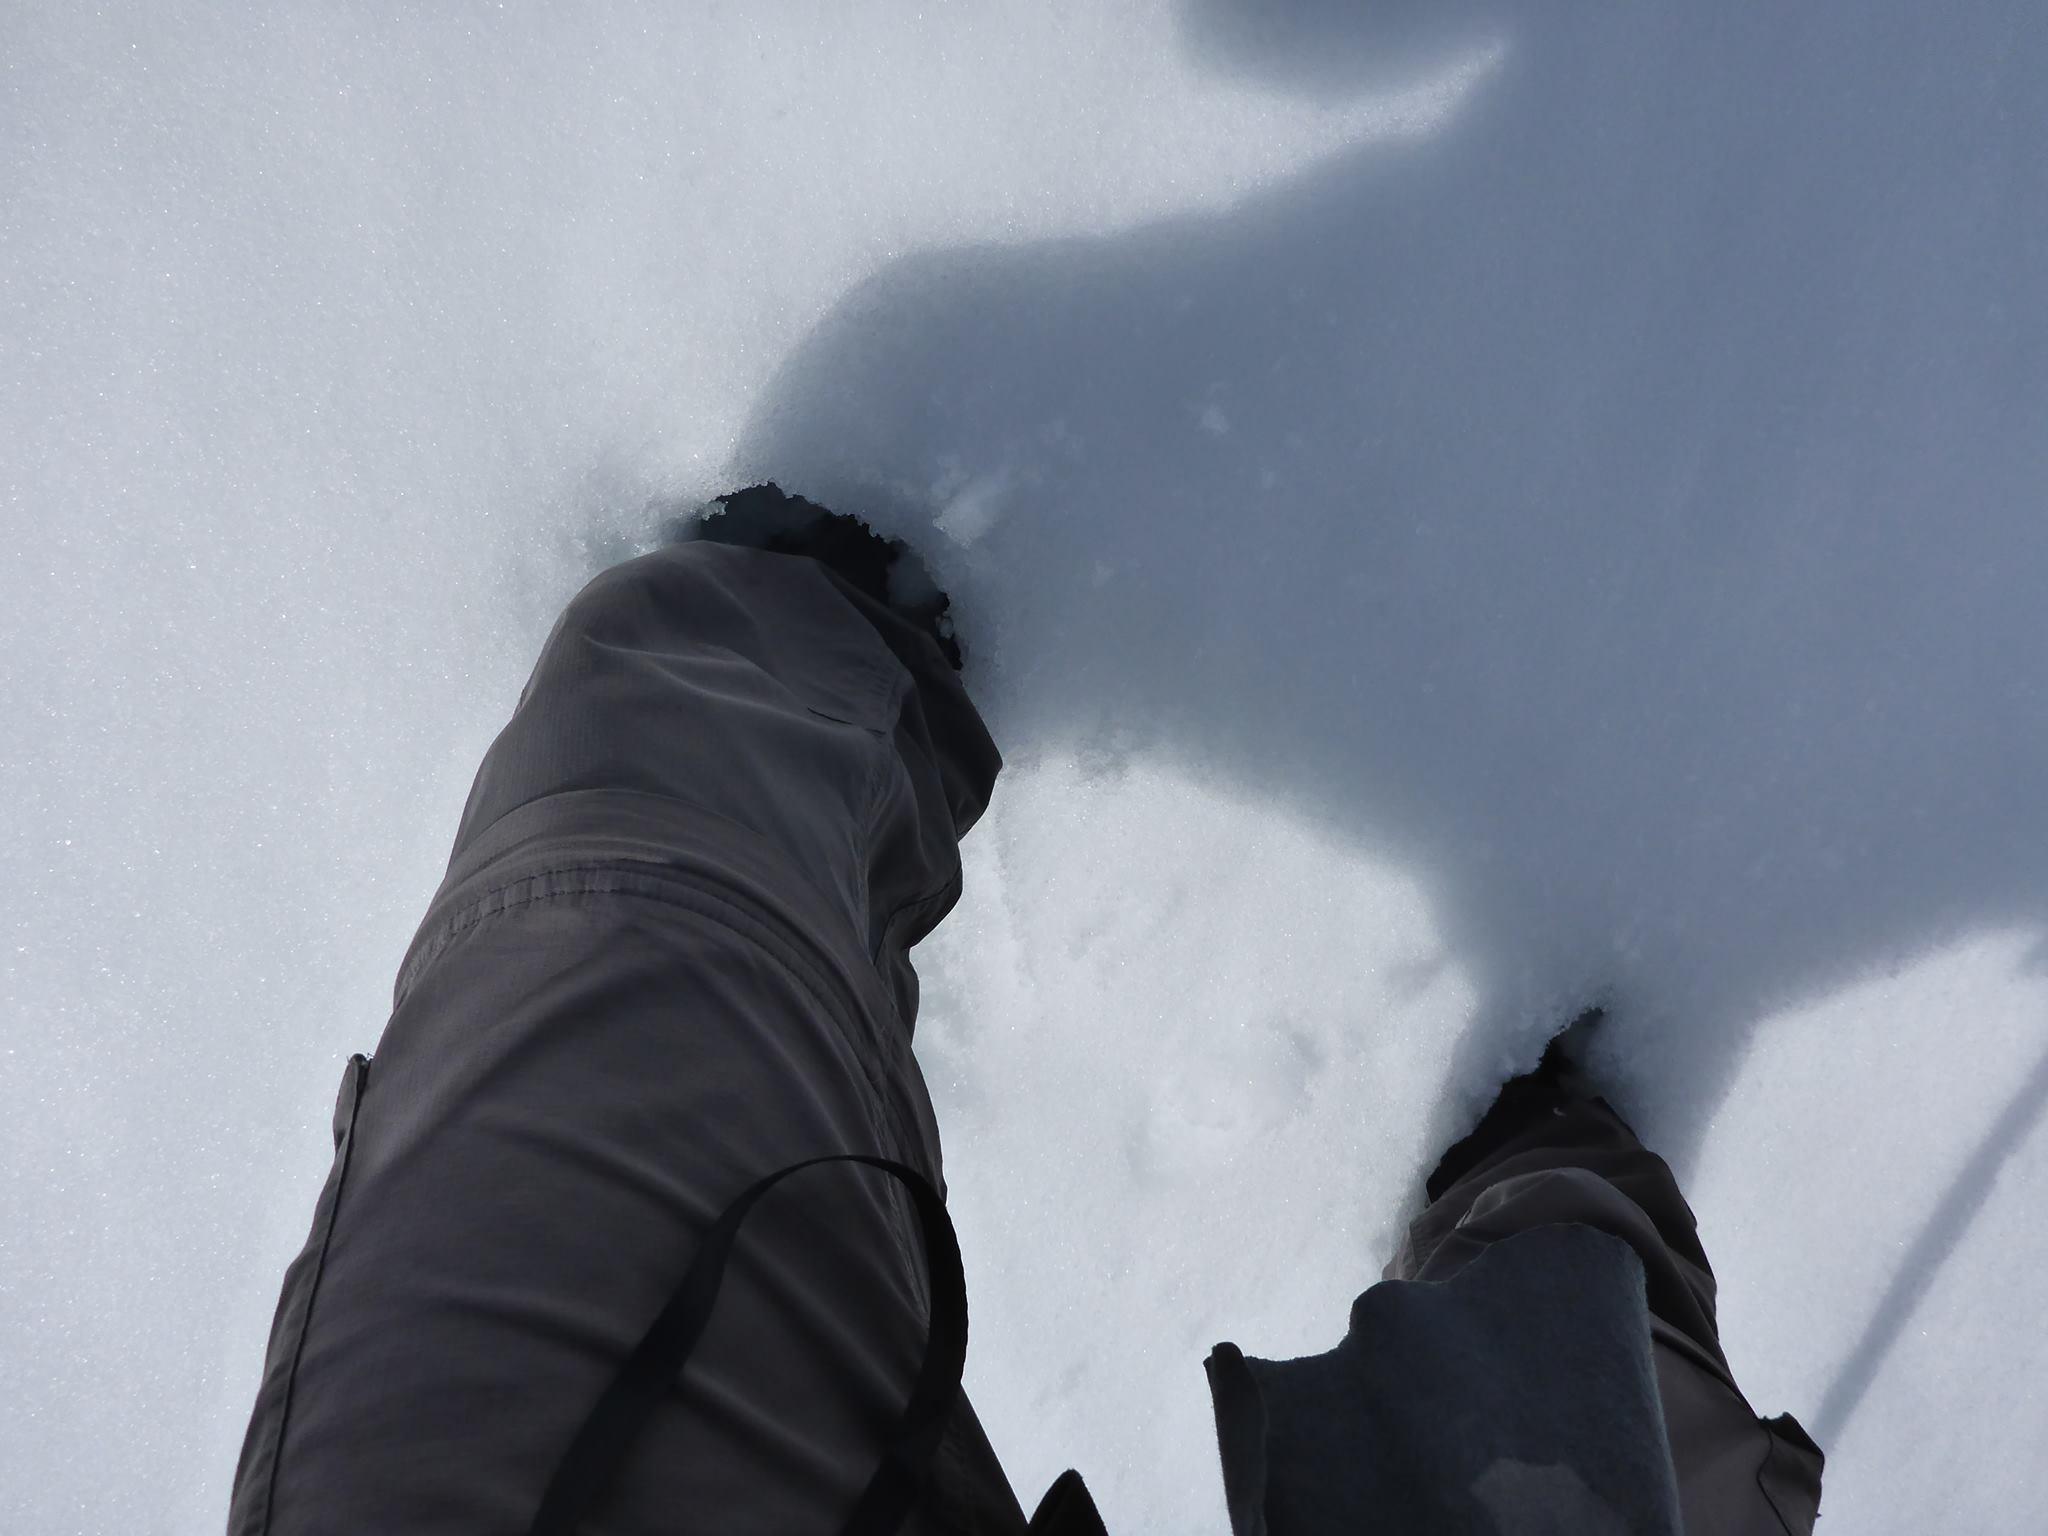 Moi qui avait cru en avoir fini avec la neige !